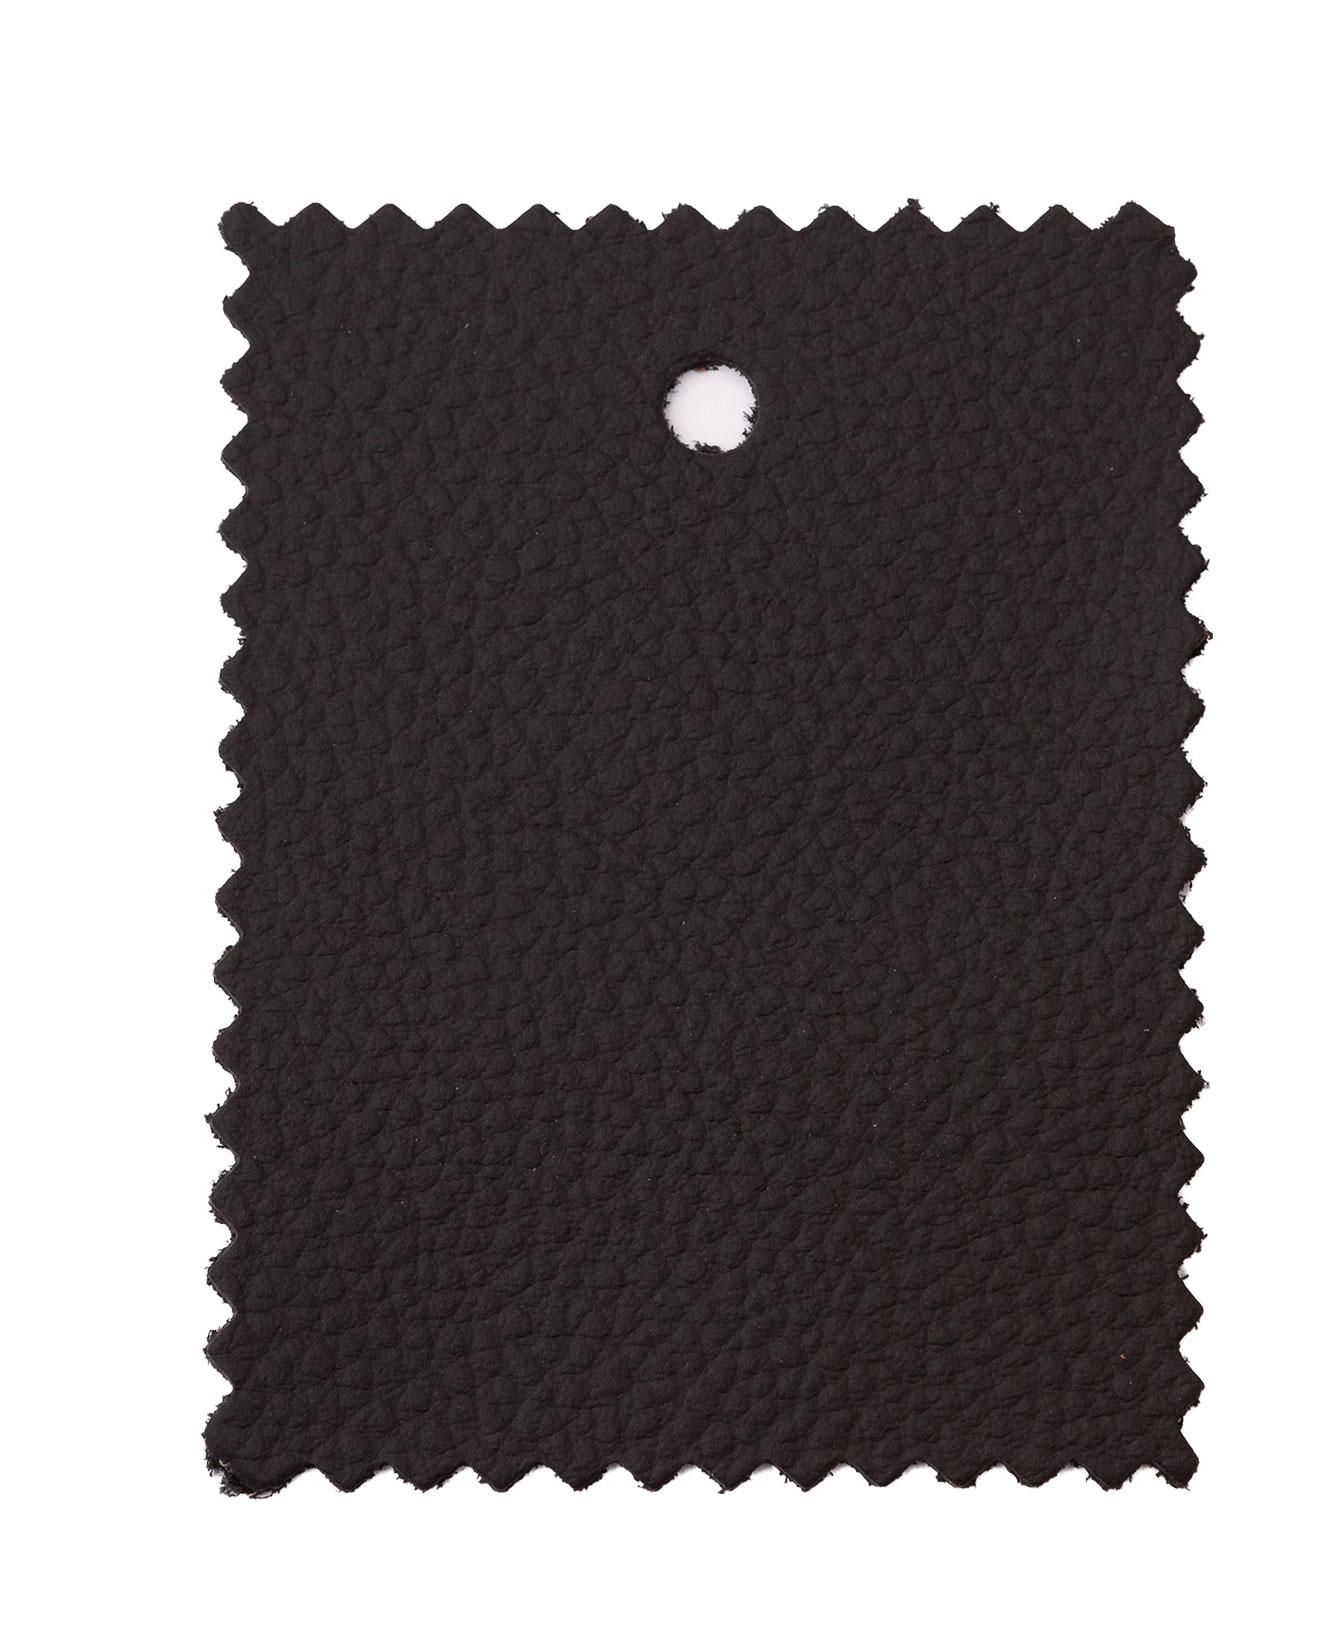 Abbildung porsche-classic-schwarz